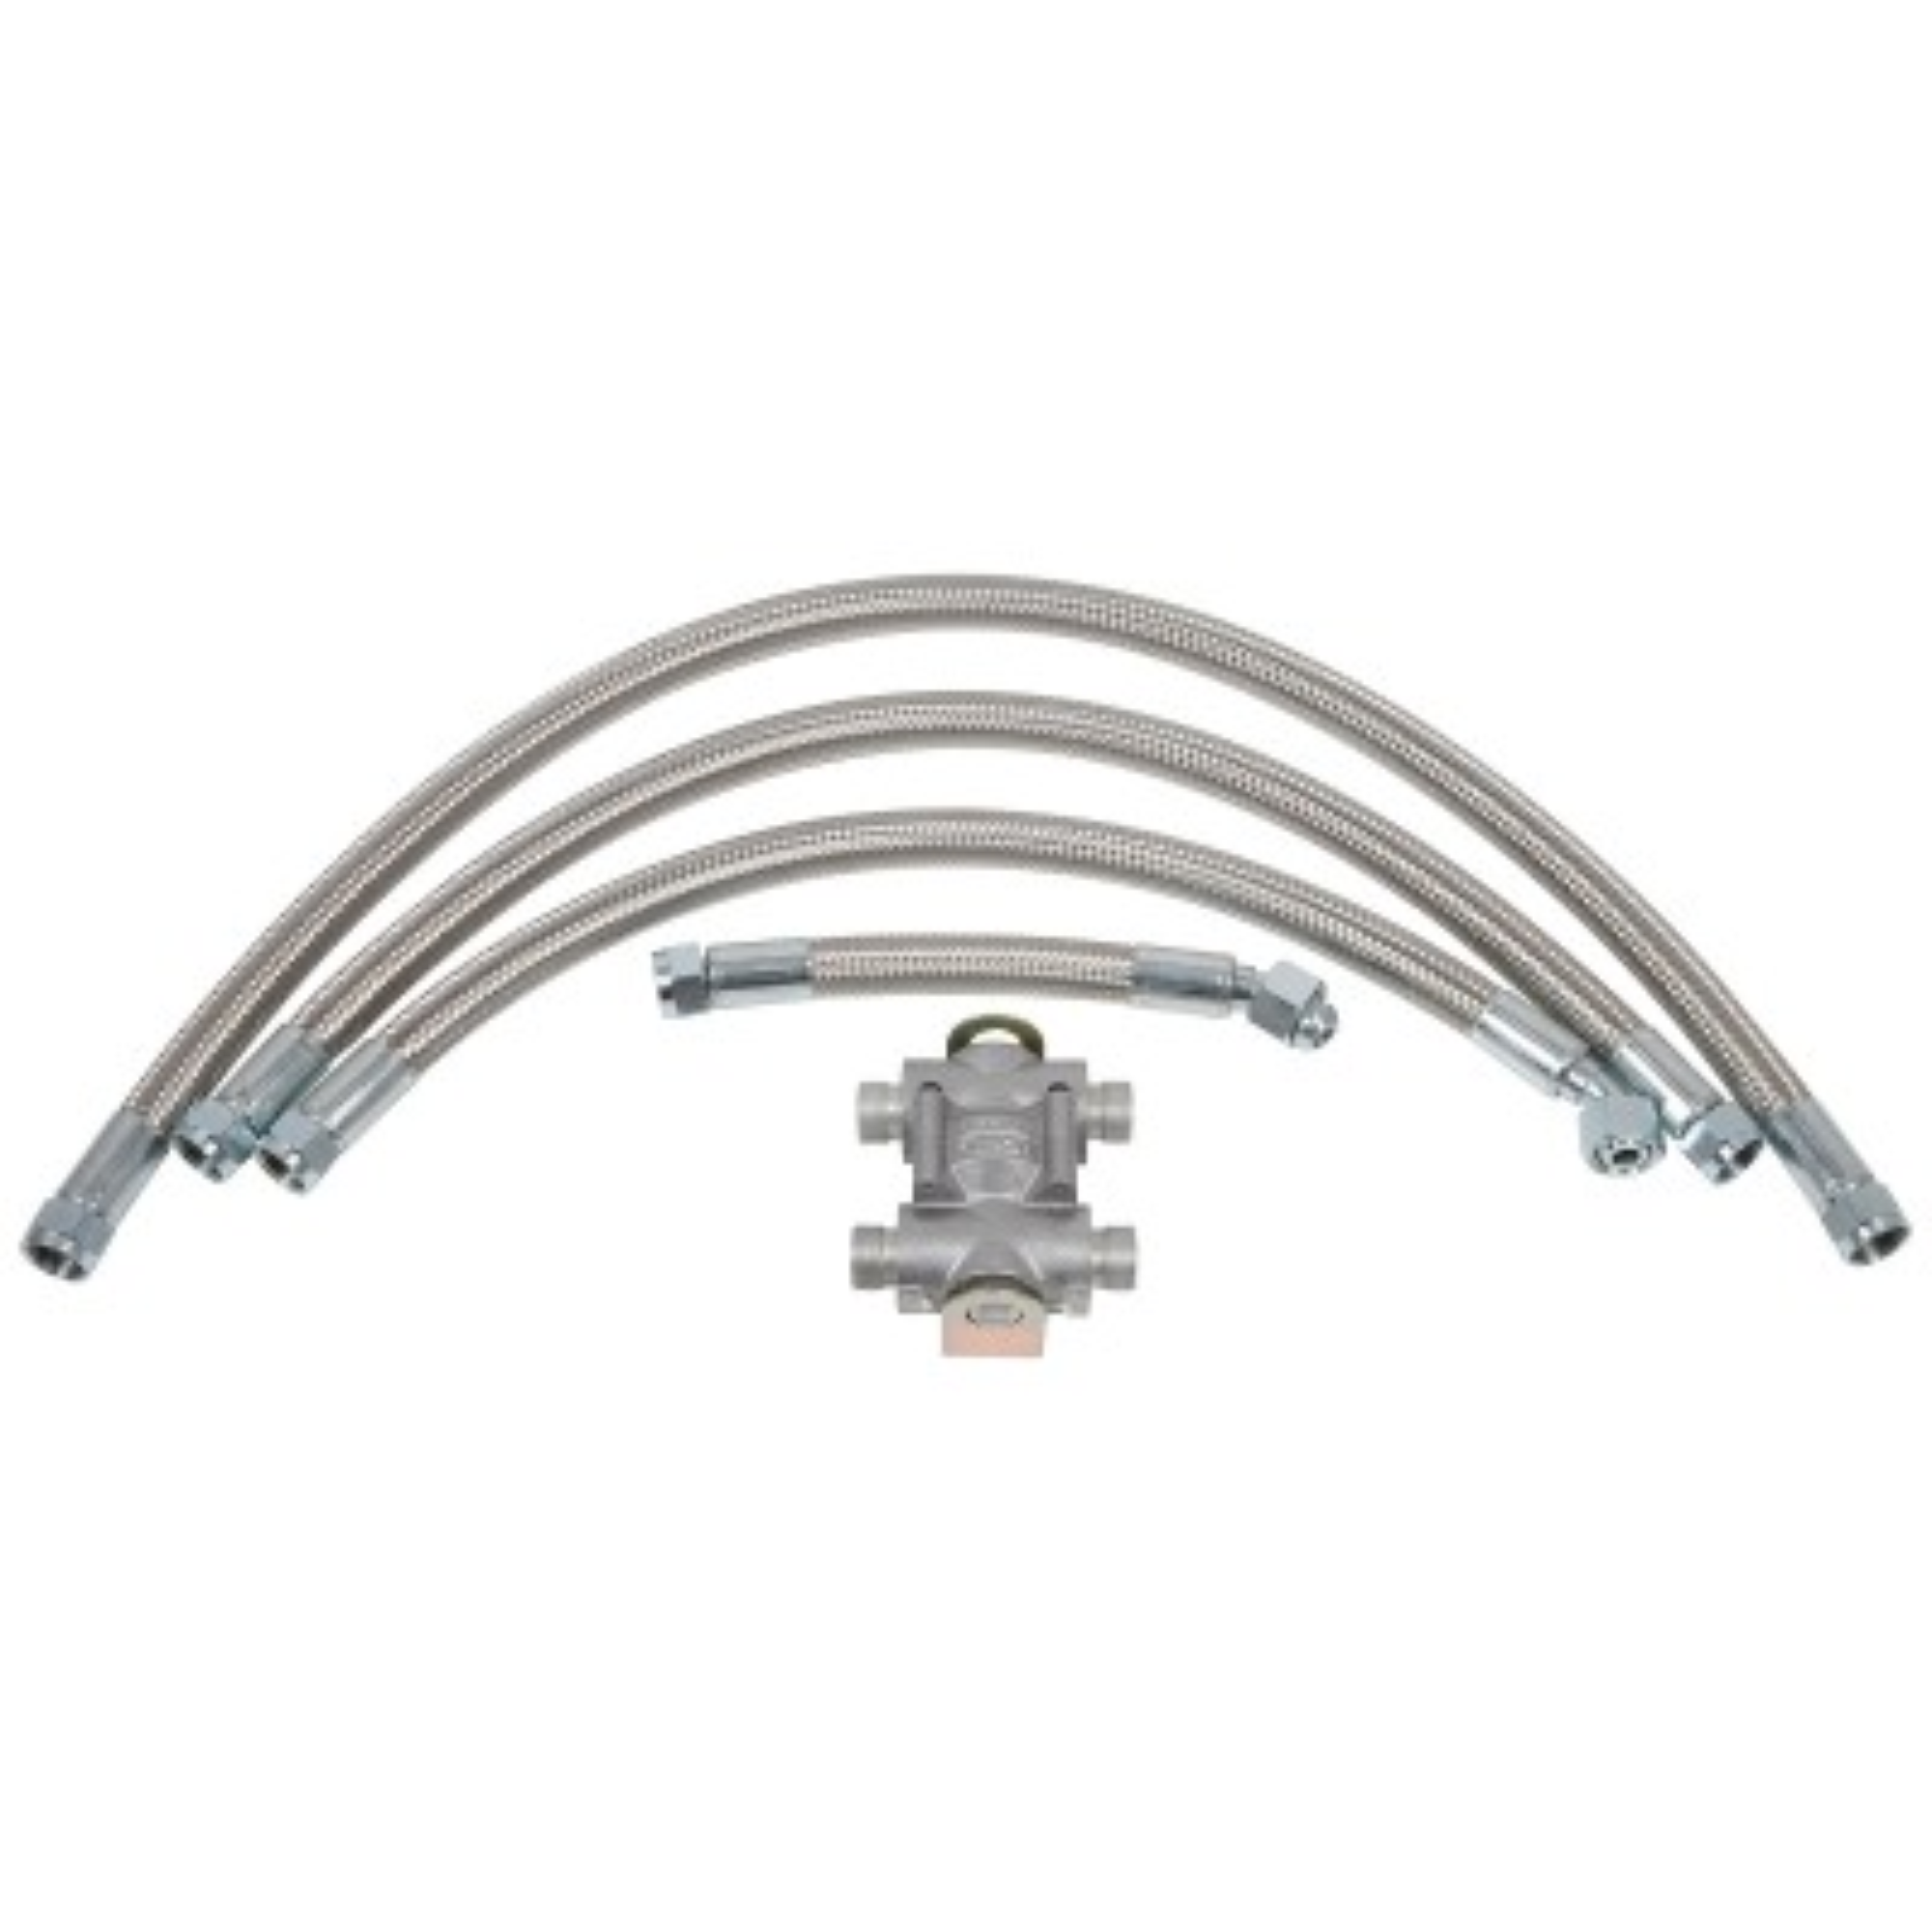 235-850 Oil Cooler Installation Kit, Stainless Steel hoses